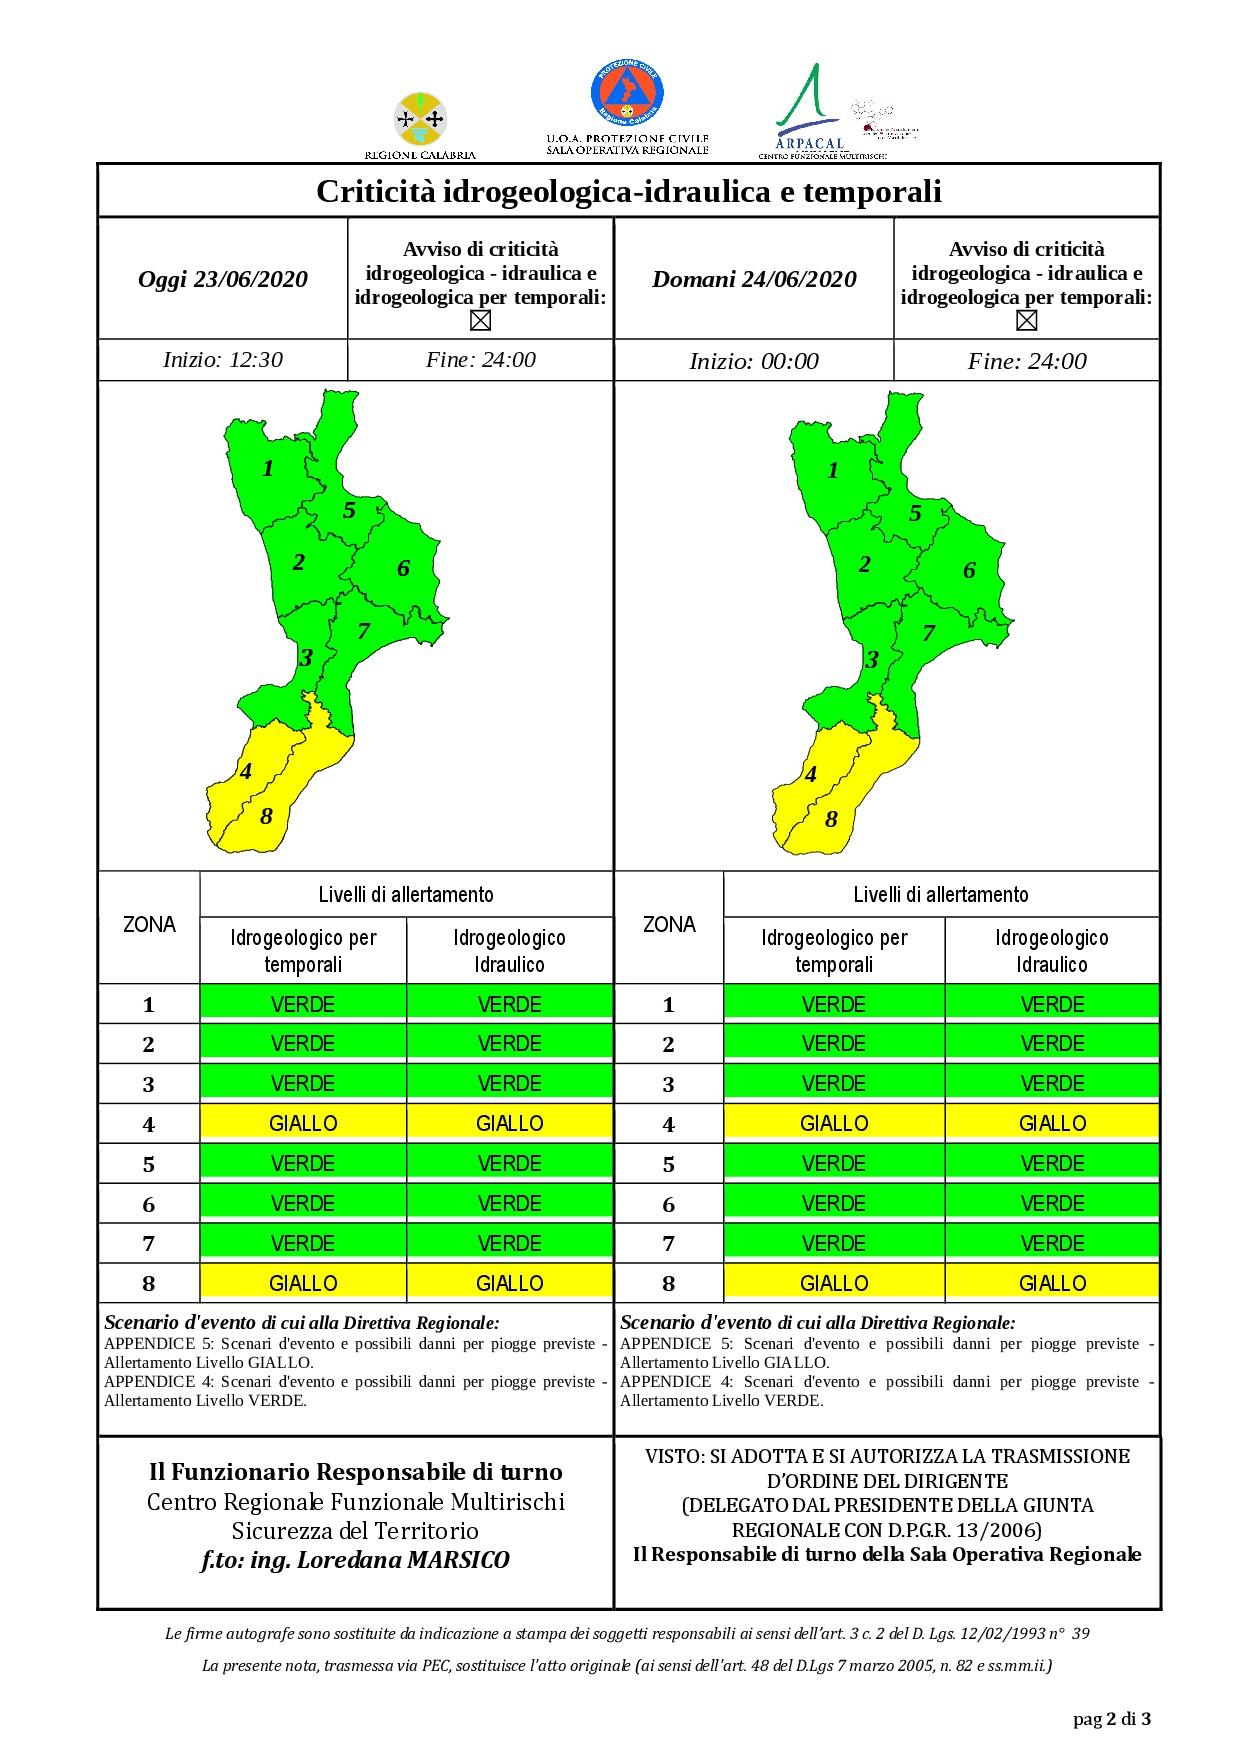 Criticità idrogeologica-idraulica e temporali in Calabria 23-06-2020